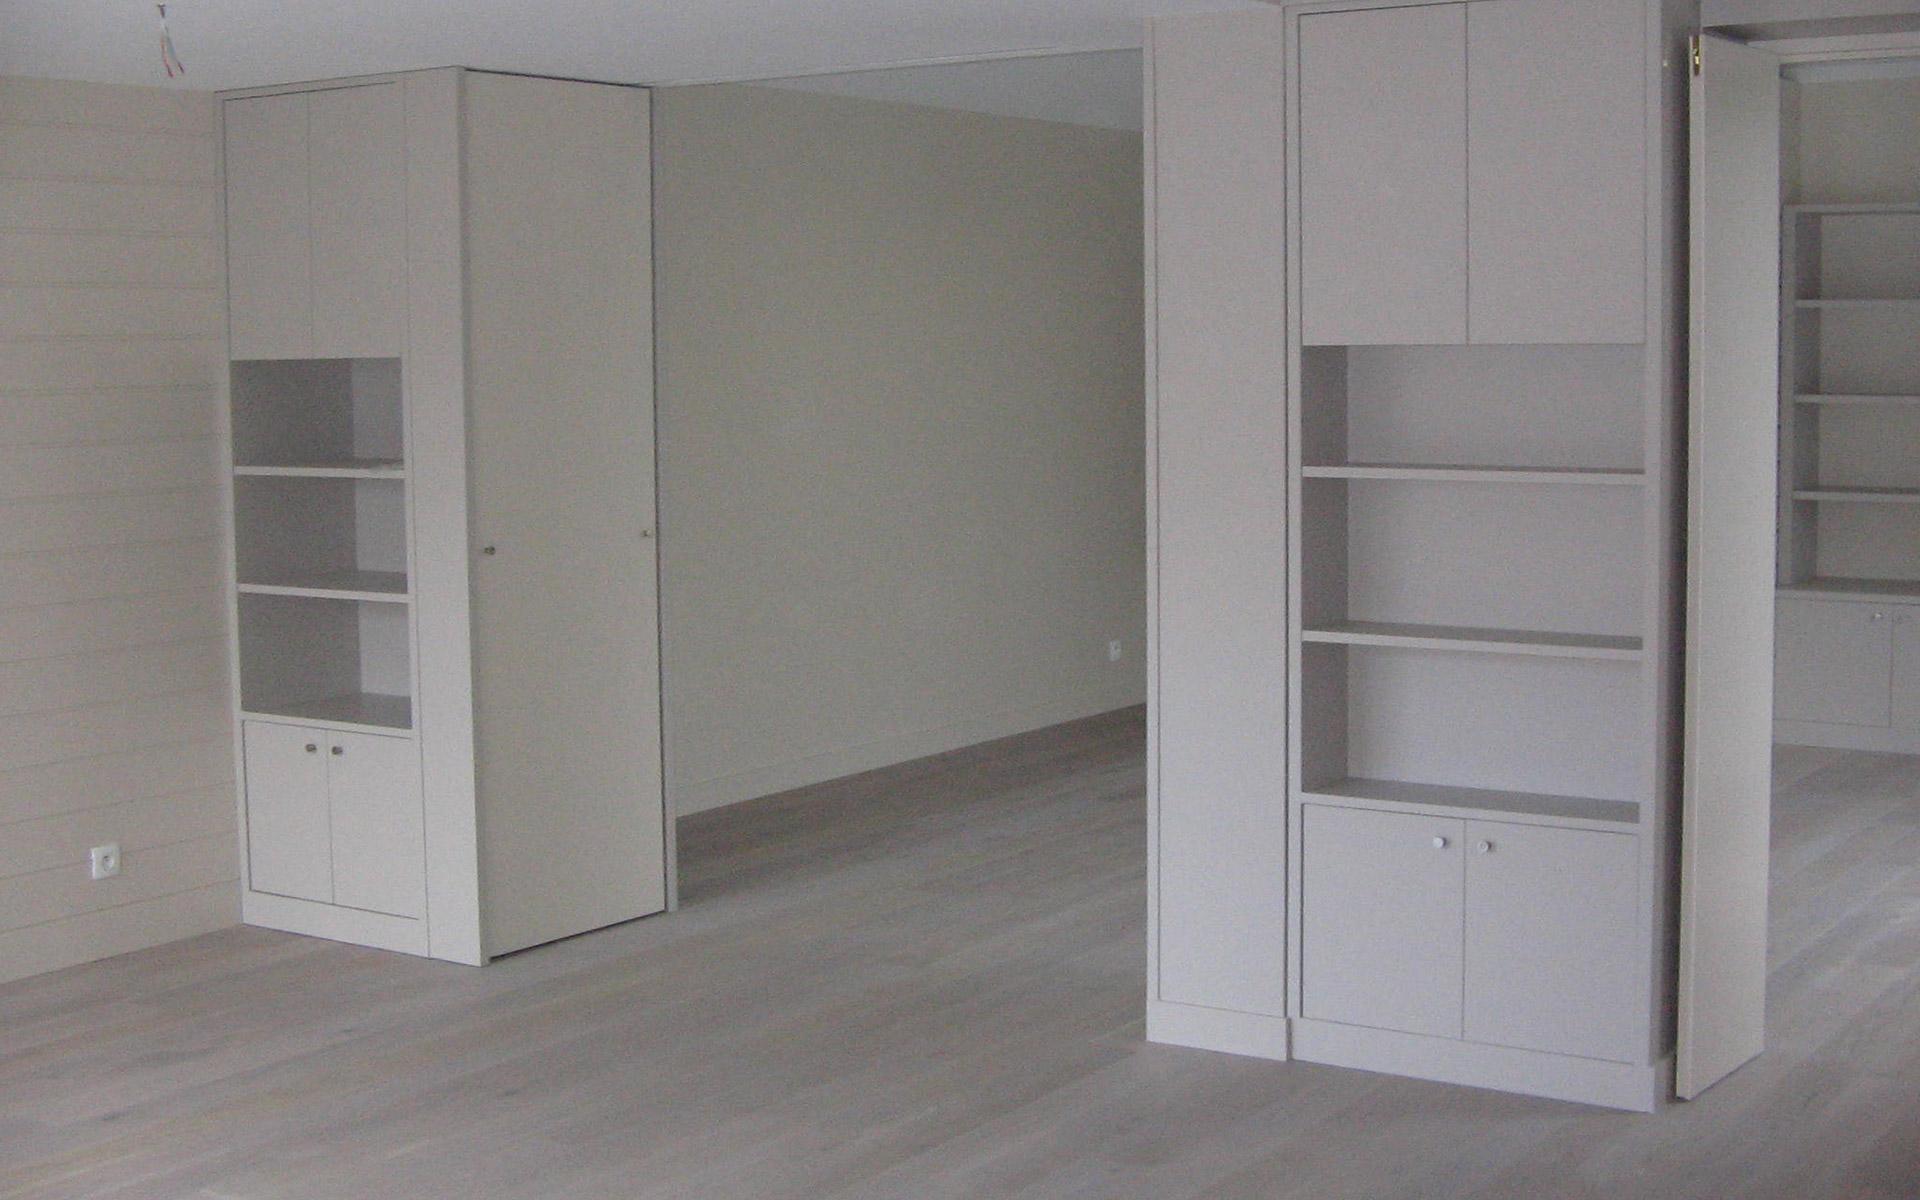 amenagement-interieur-bibliotheque-placard-bois-fabrication-pose-maison-particuliers-menuiserie-josselin-pleslin-trigavou-dinan-dinard-saint-malo